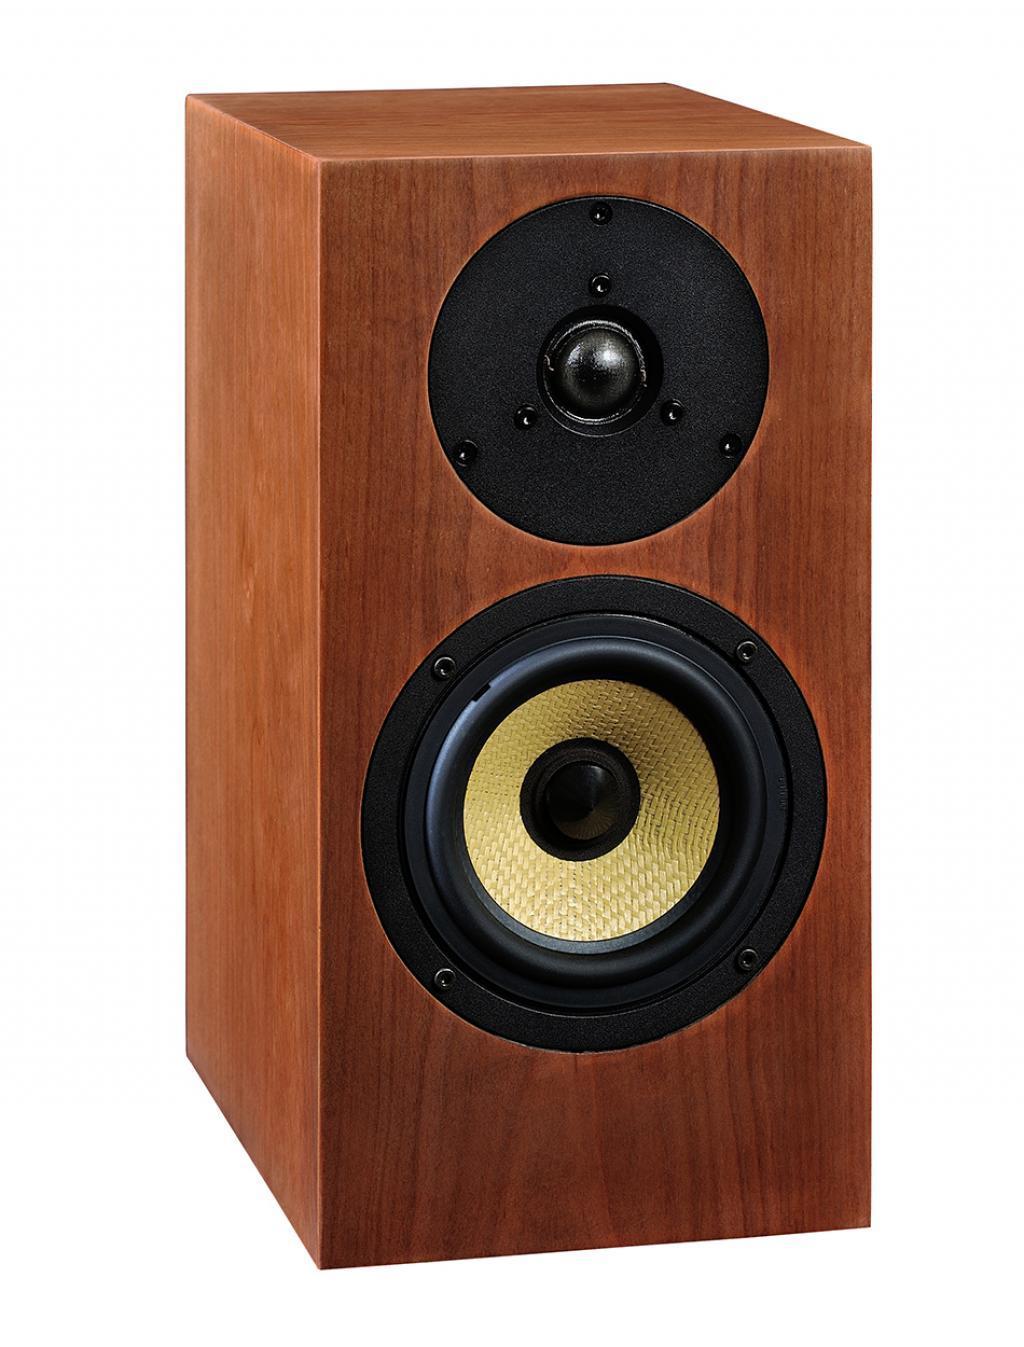 Boxe Davis Acoustics Olympia One Master Cherrywood